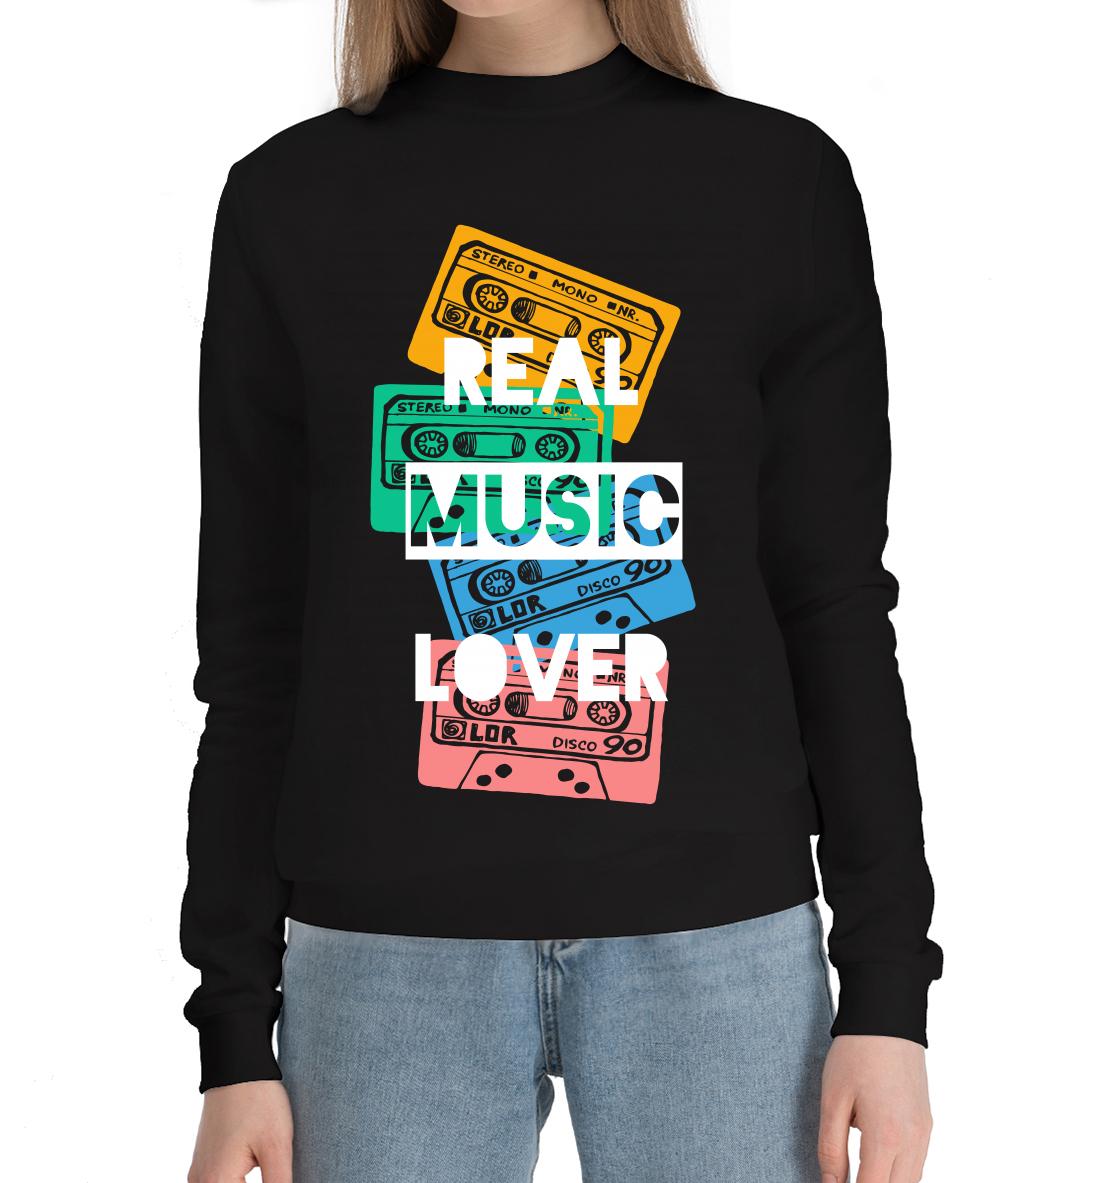 Real music lover mikael niemi popular music